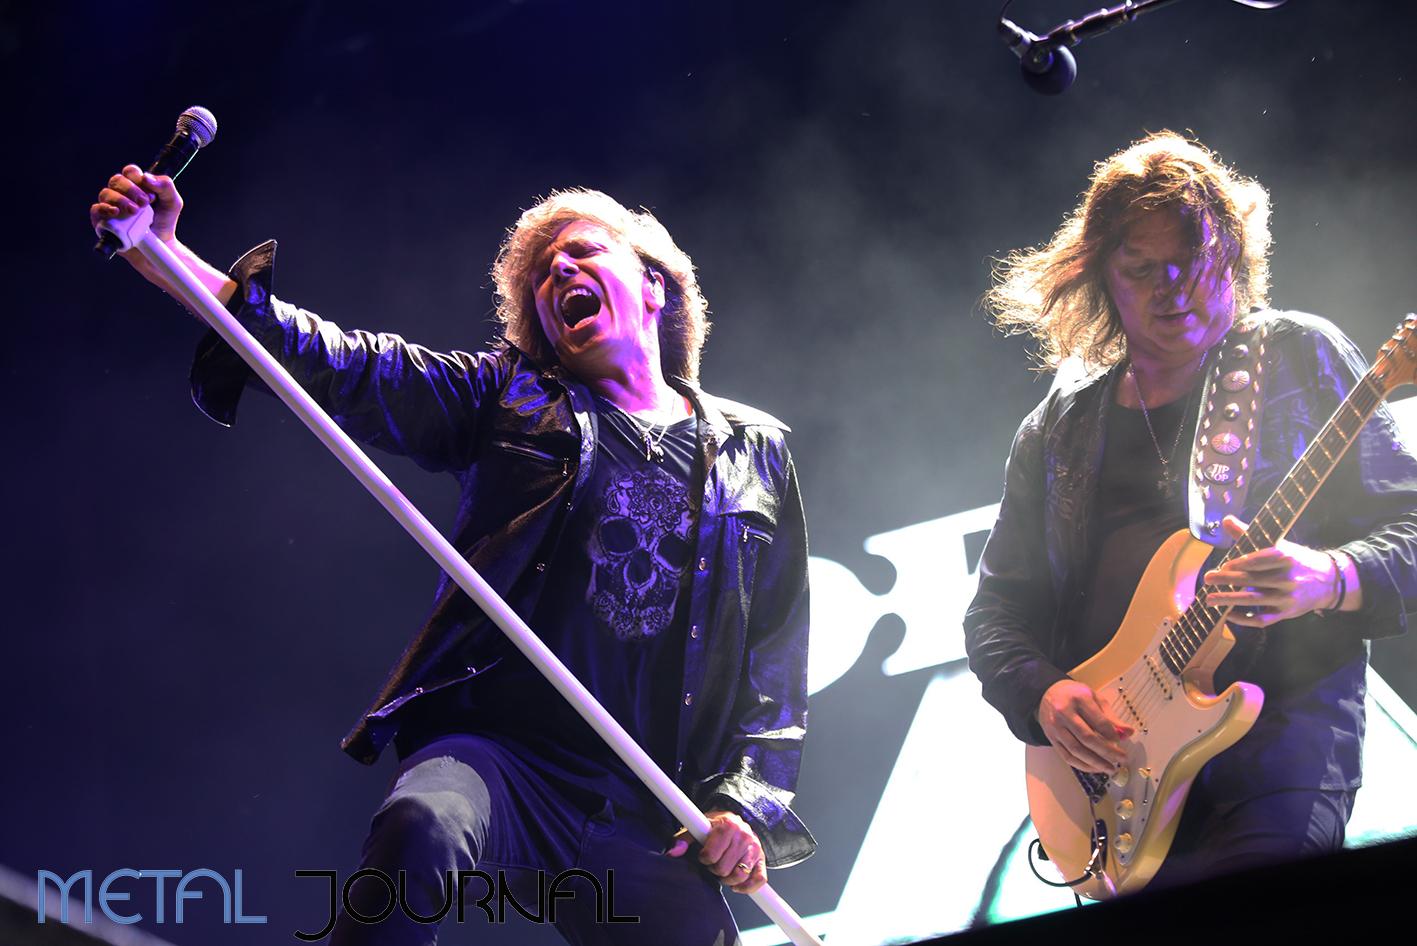 europe - metal journal rock fest barcelona 2019 pic 1